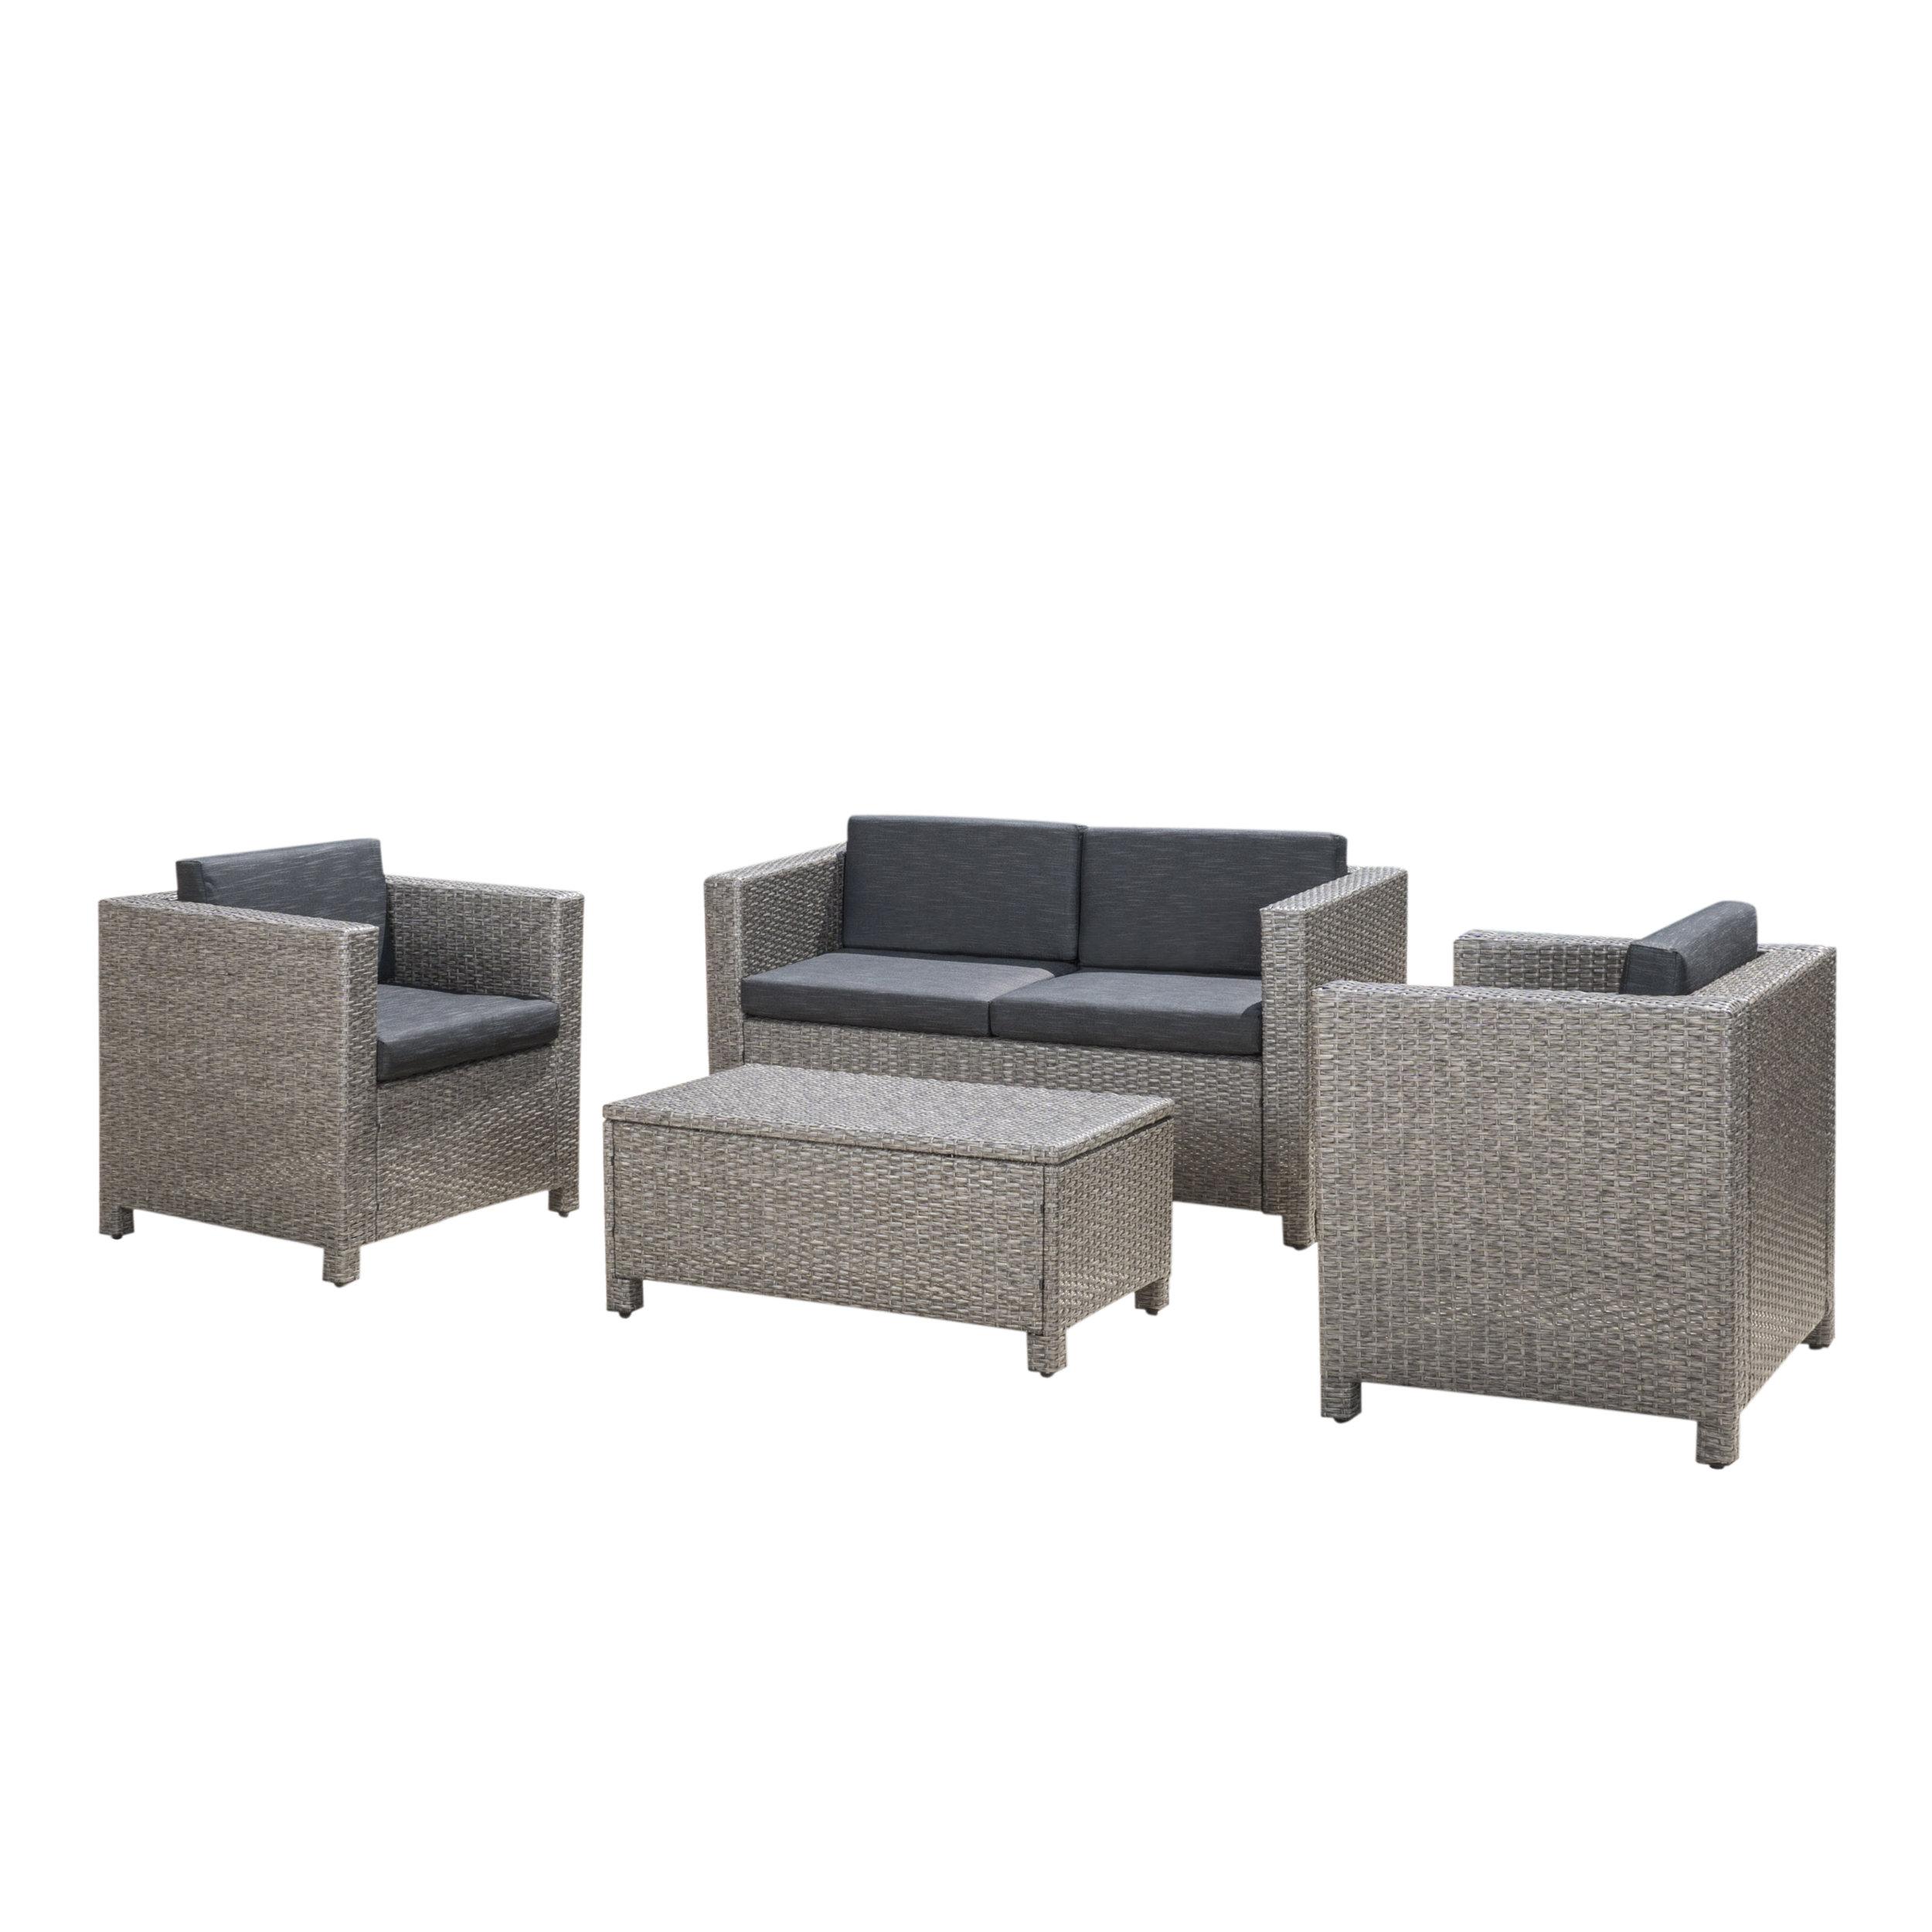 Ka 4 Piece Rattan Sofa Seating Group With Cushions Reviews Allmodern